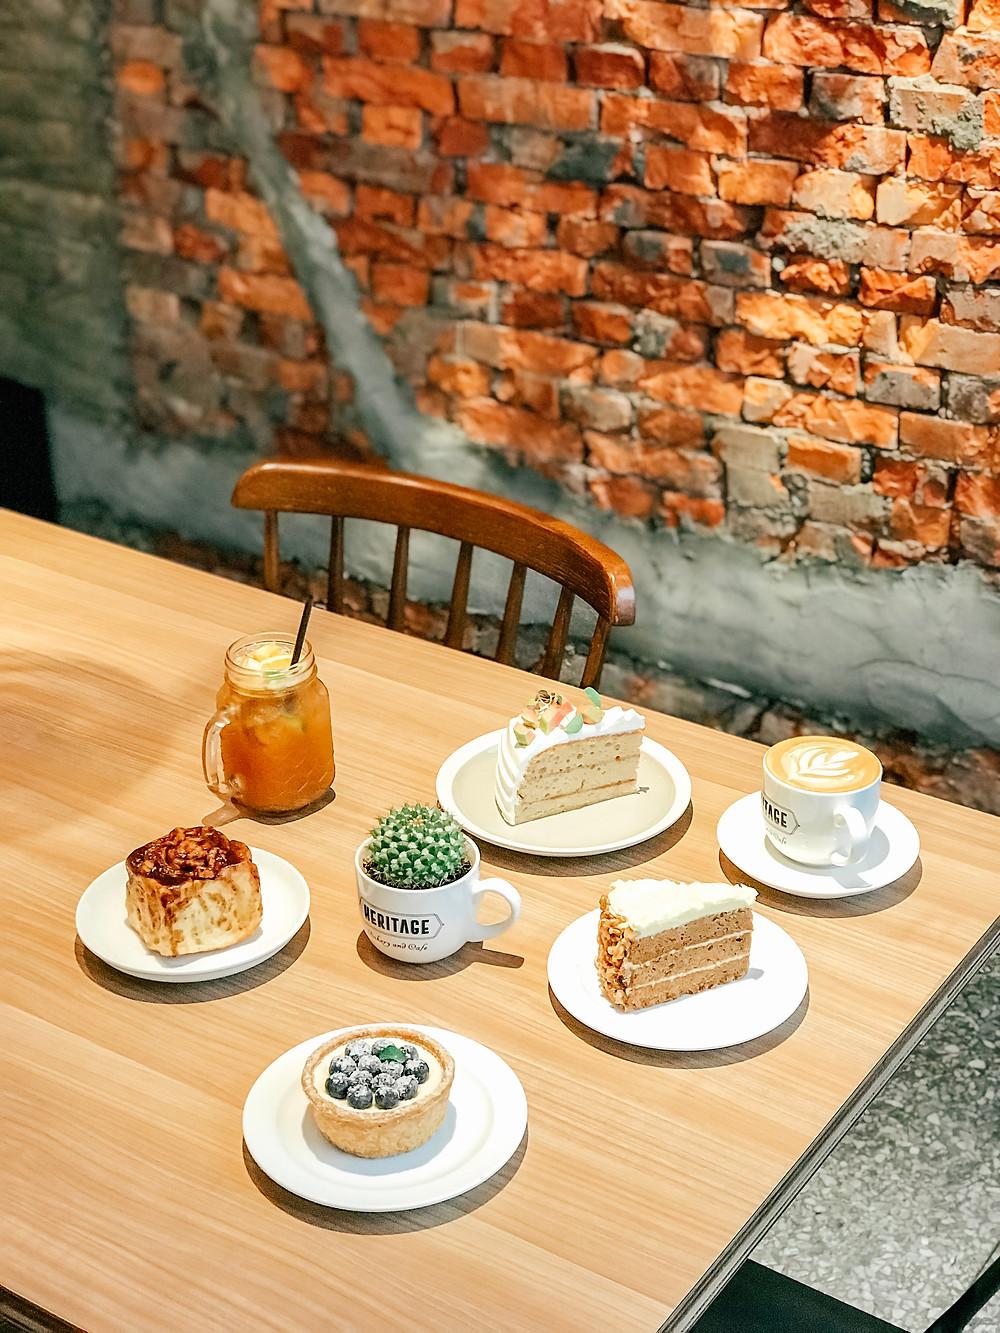 Best Desserts Taipei l Heritage Bakery l A Style Alike